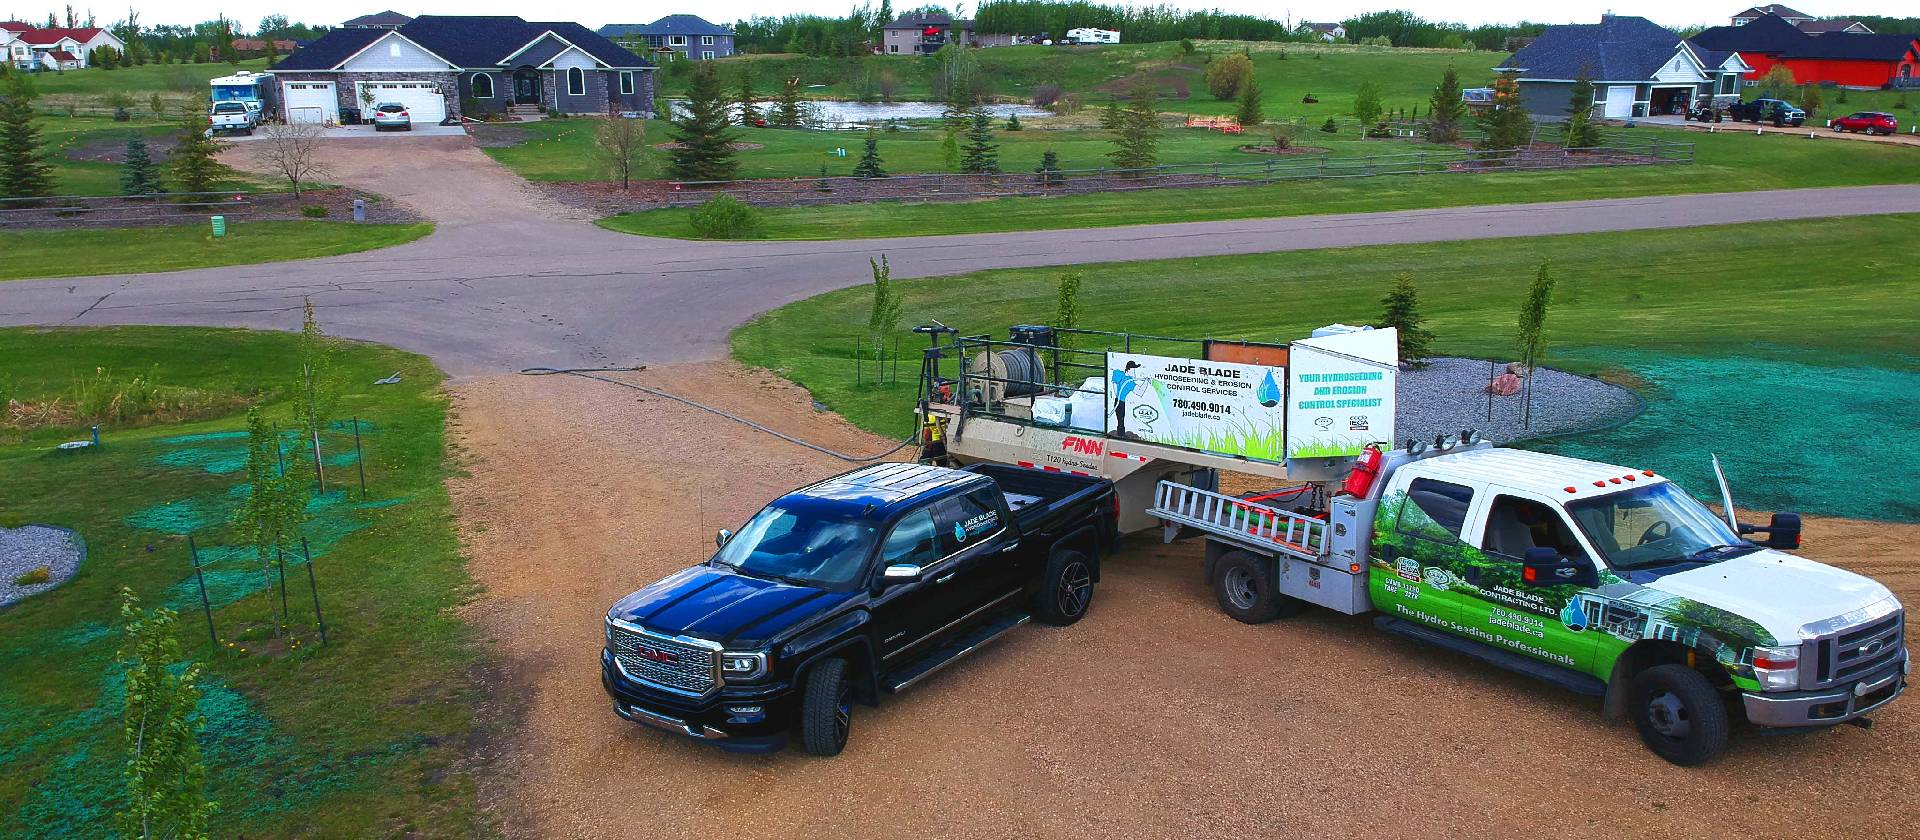 jade blade trucks gmc, hydroseeding truck